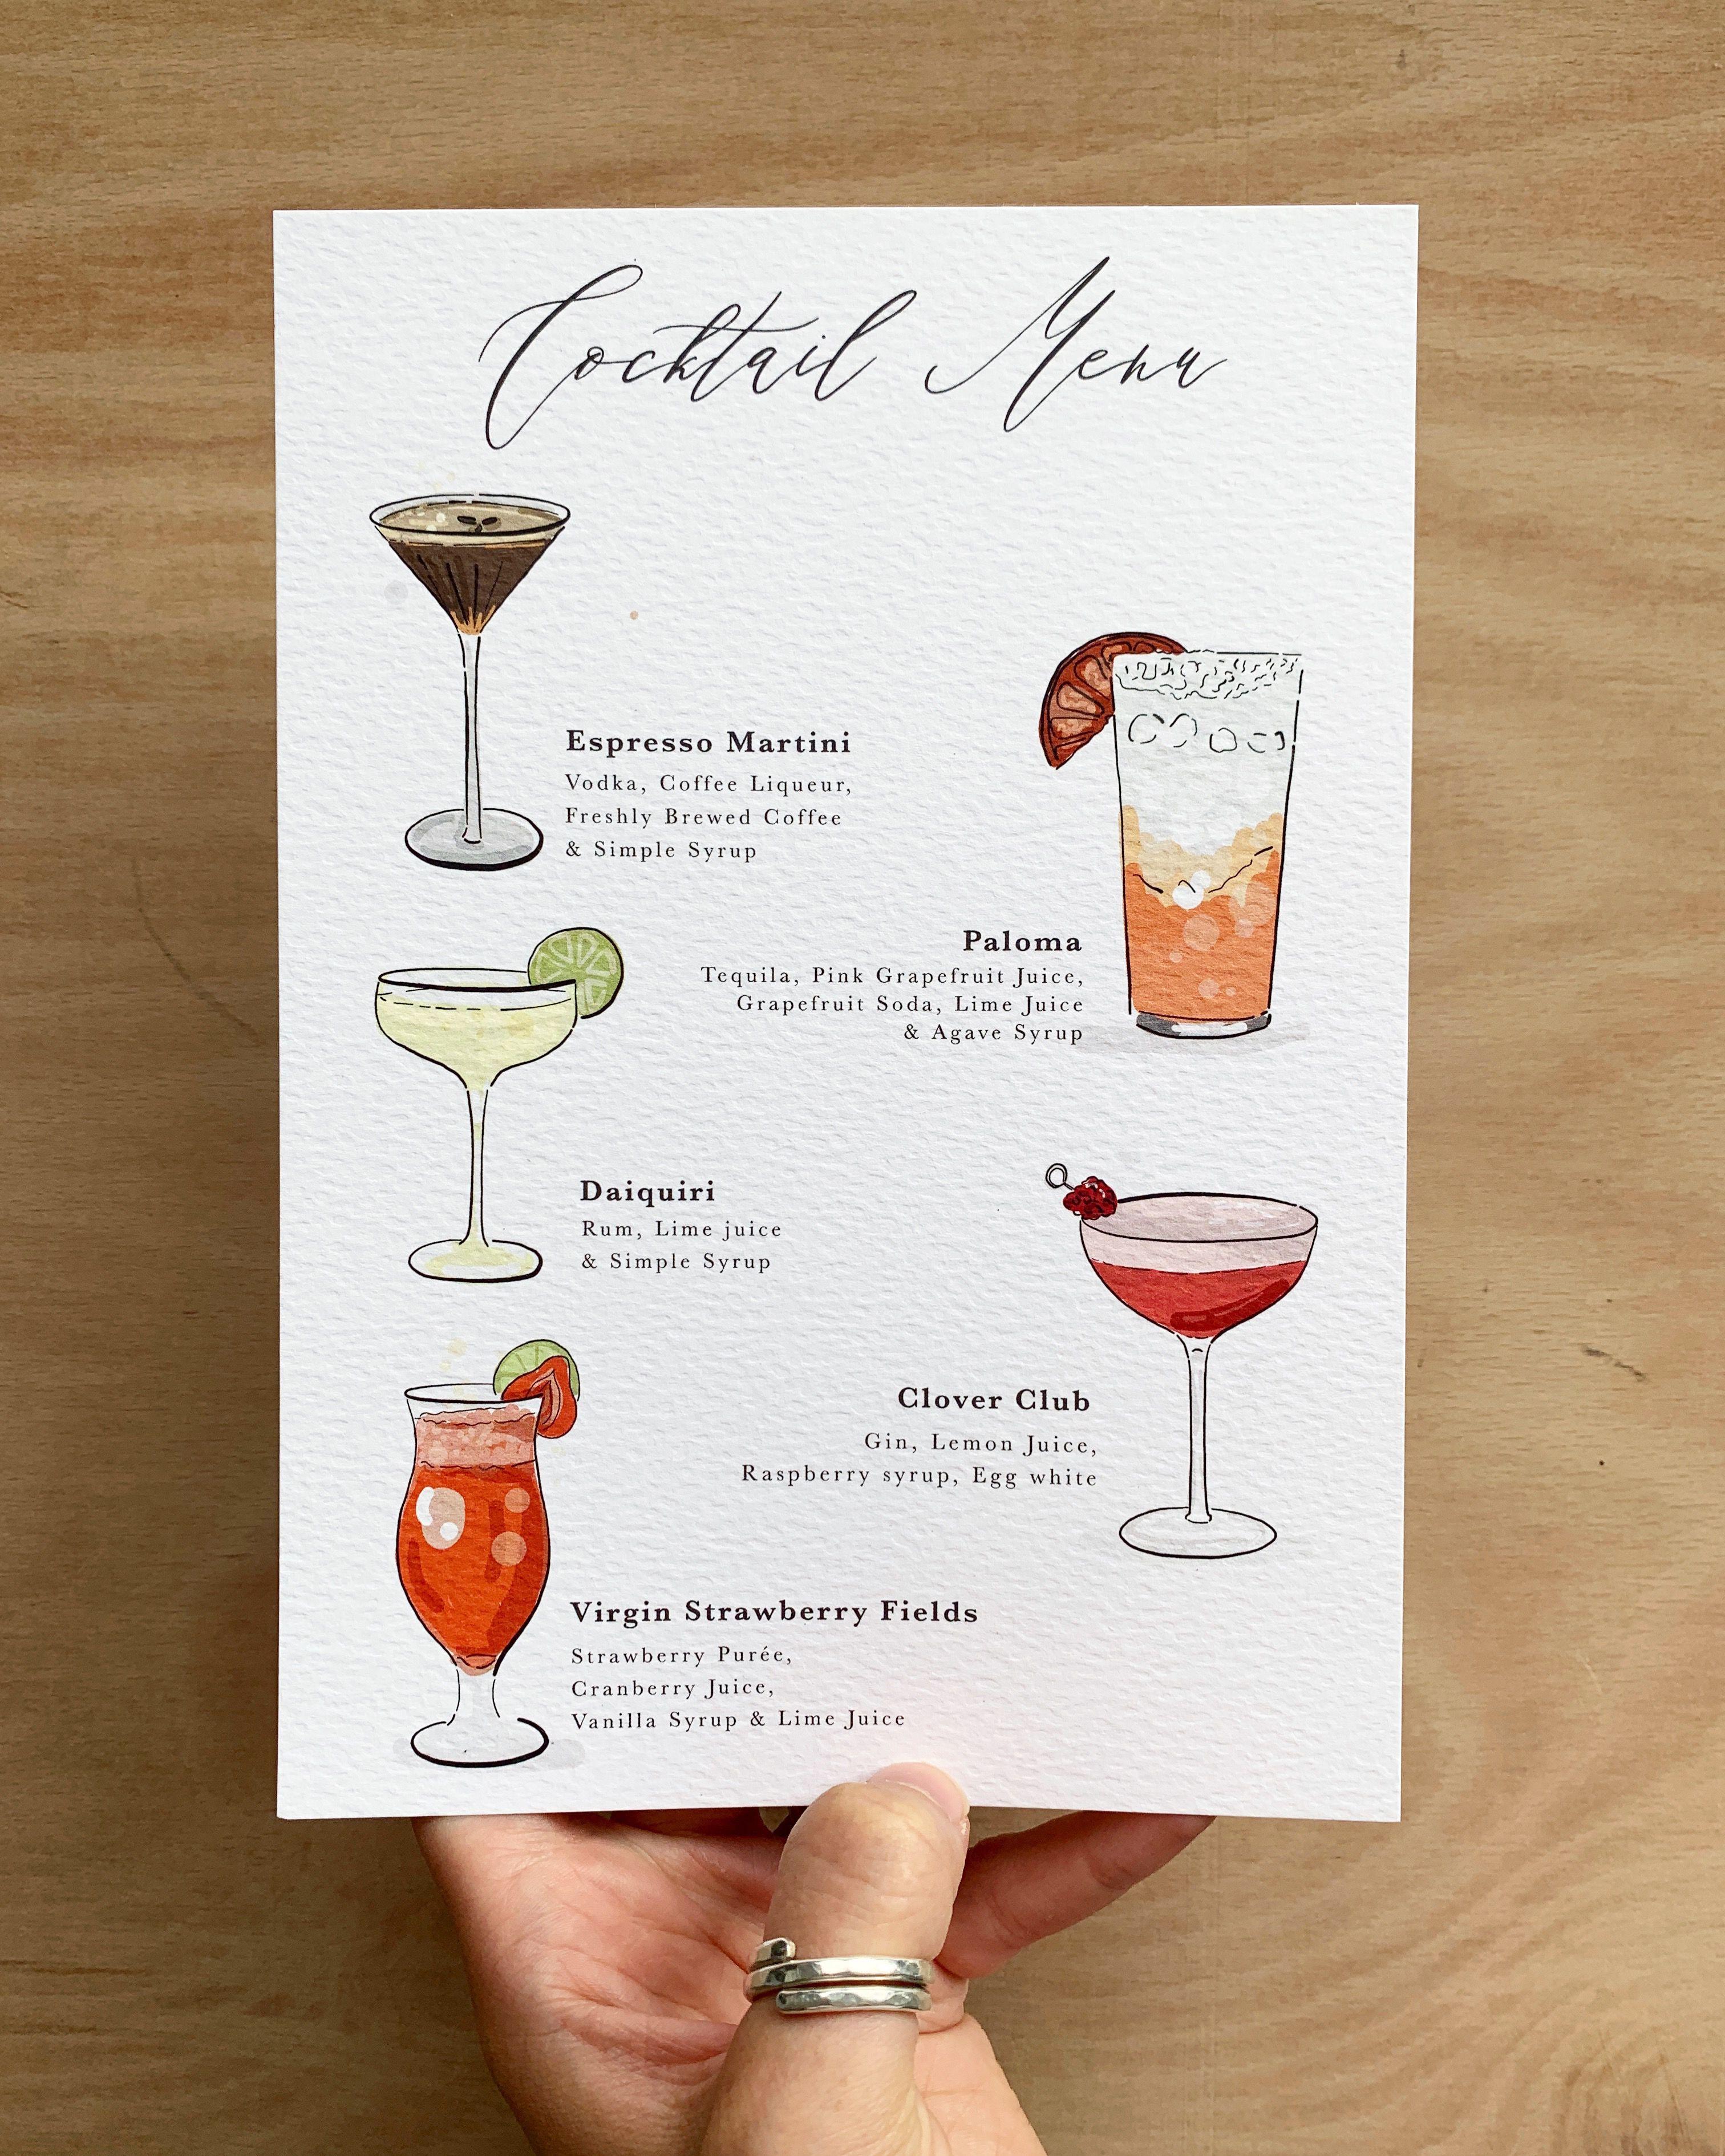 Cocktail Menu In 2021 Cocktail Menu Wedding Cocktail Menu Menu Illustration